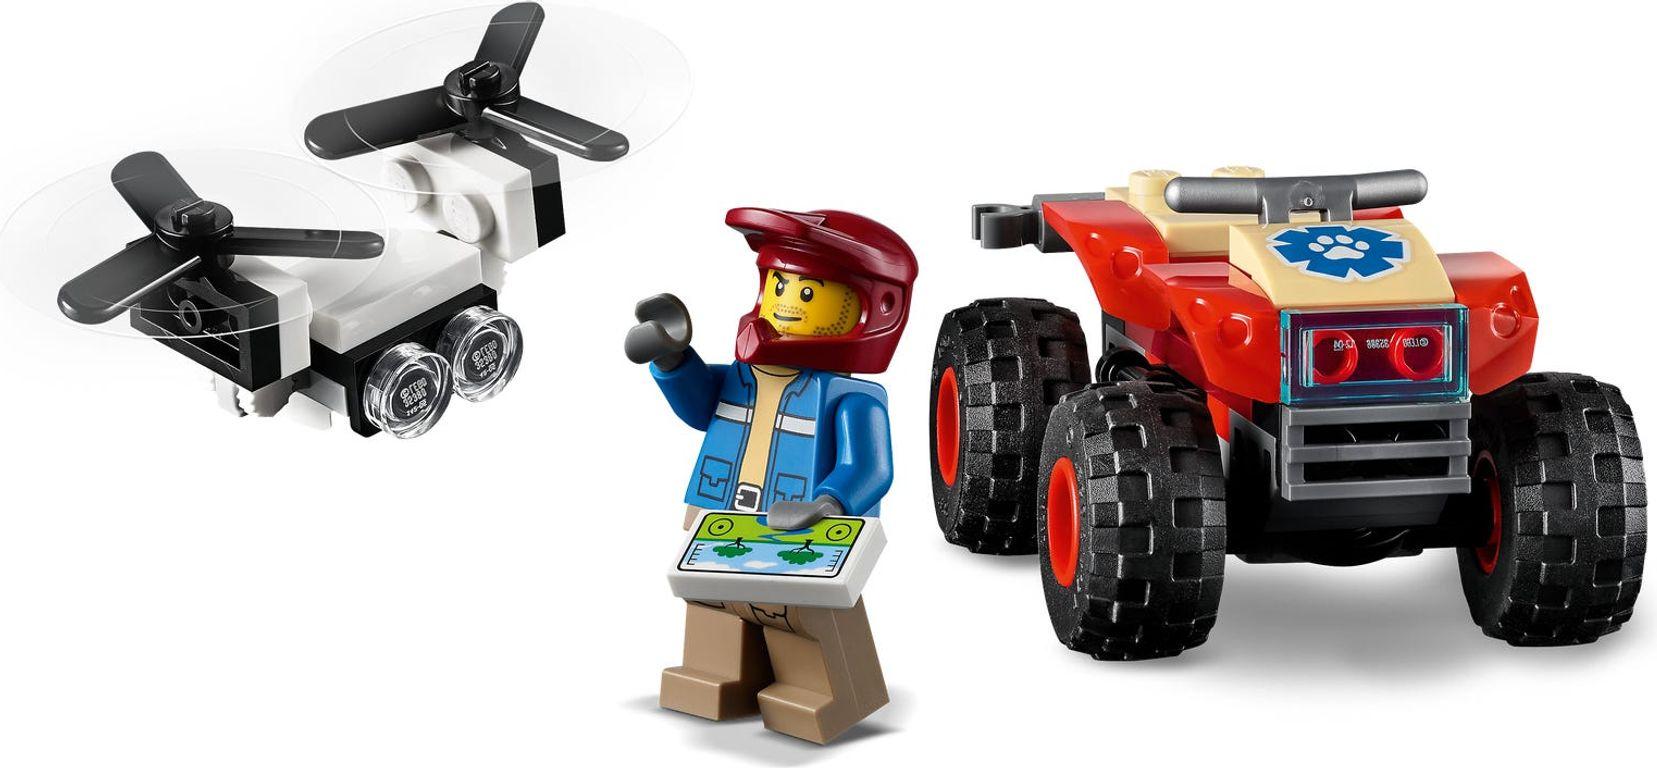 LEGO® City Wildlife Rescue ATV minifigures